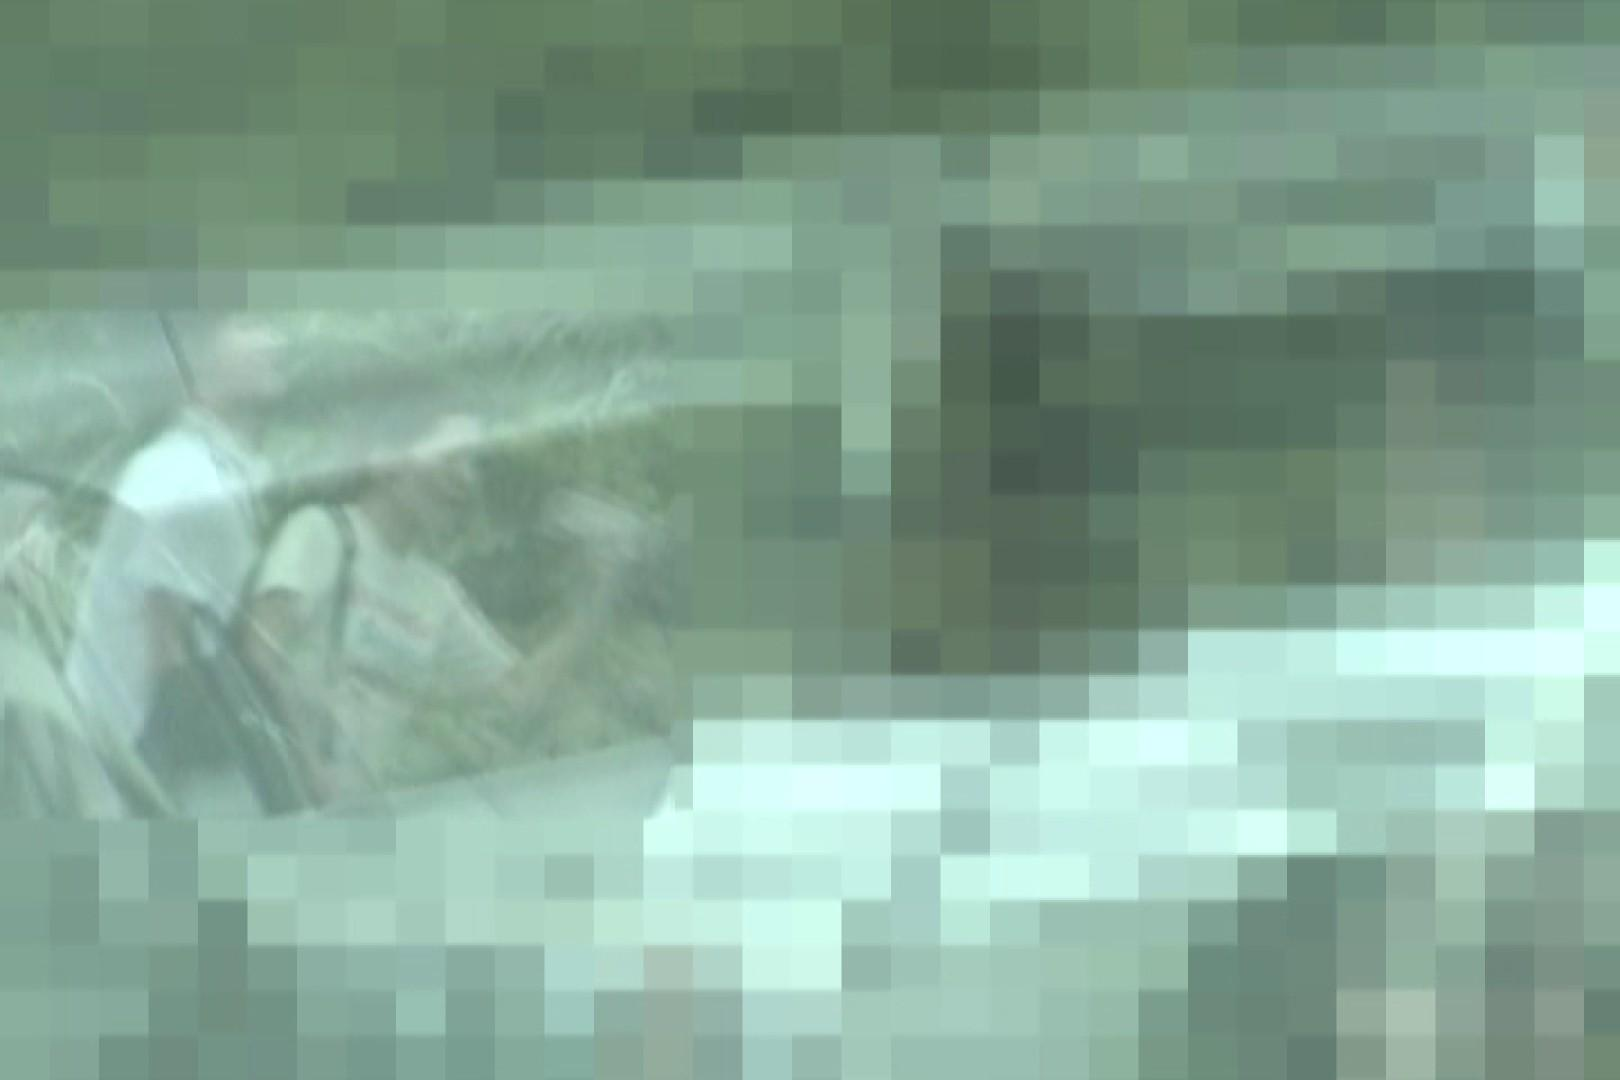 Aquaな露天風呂Vol.793 盗撮映像  72Pix 5